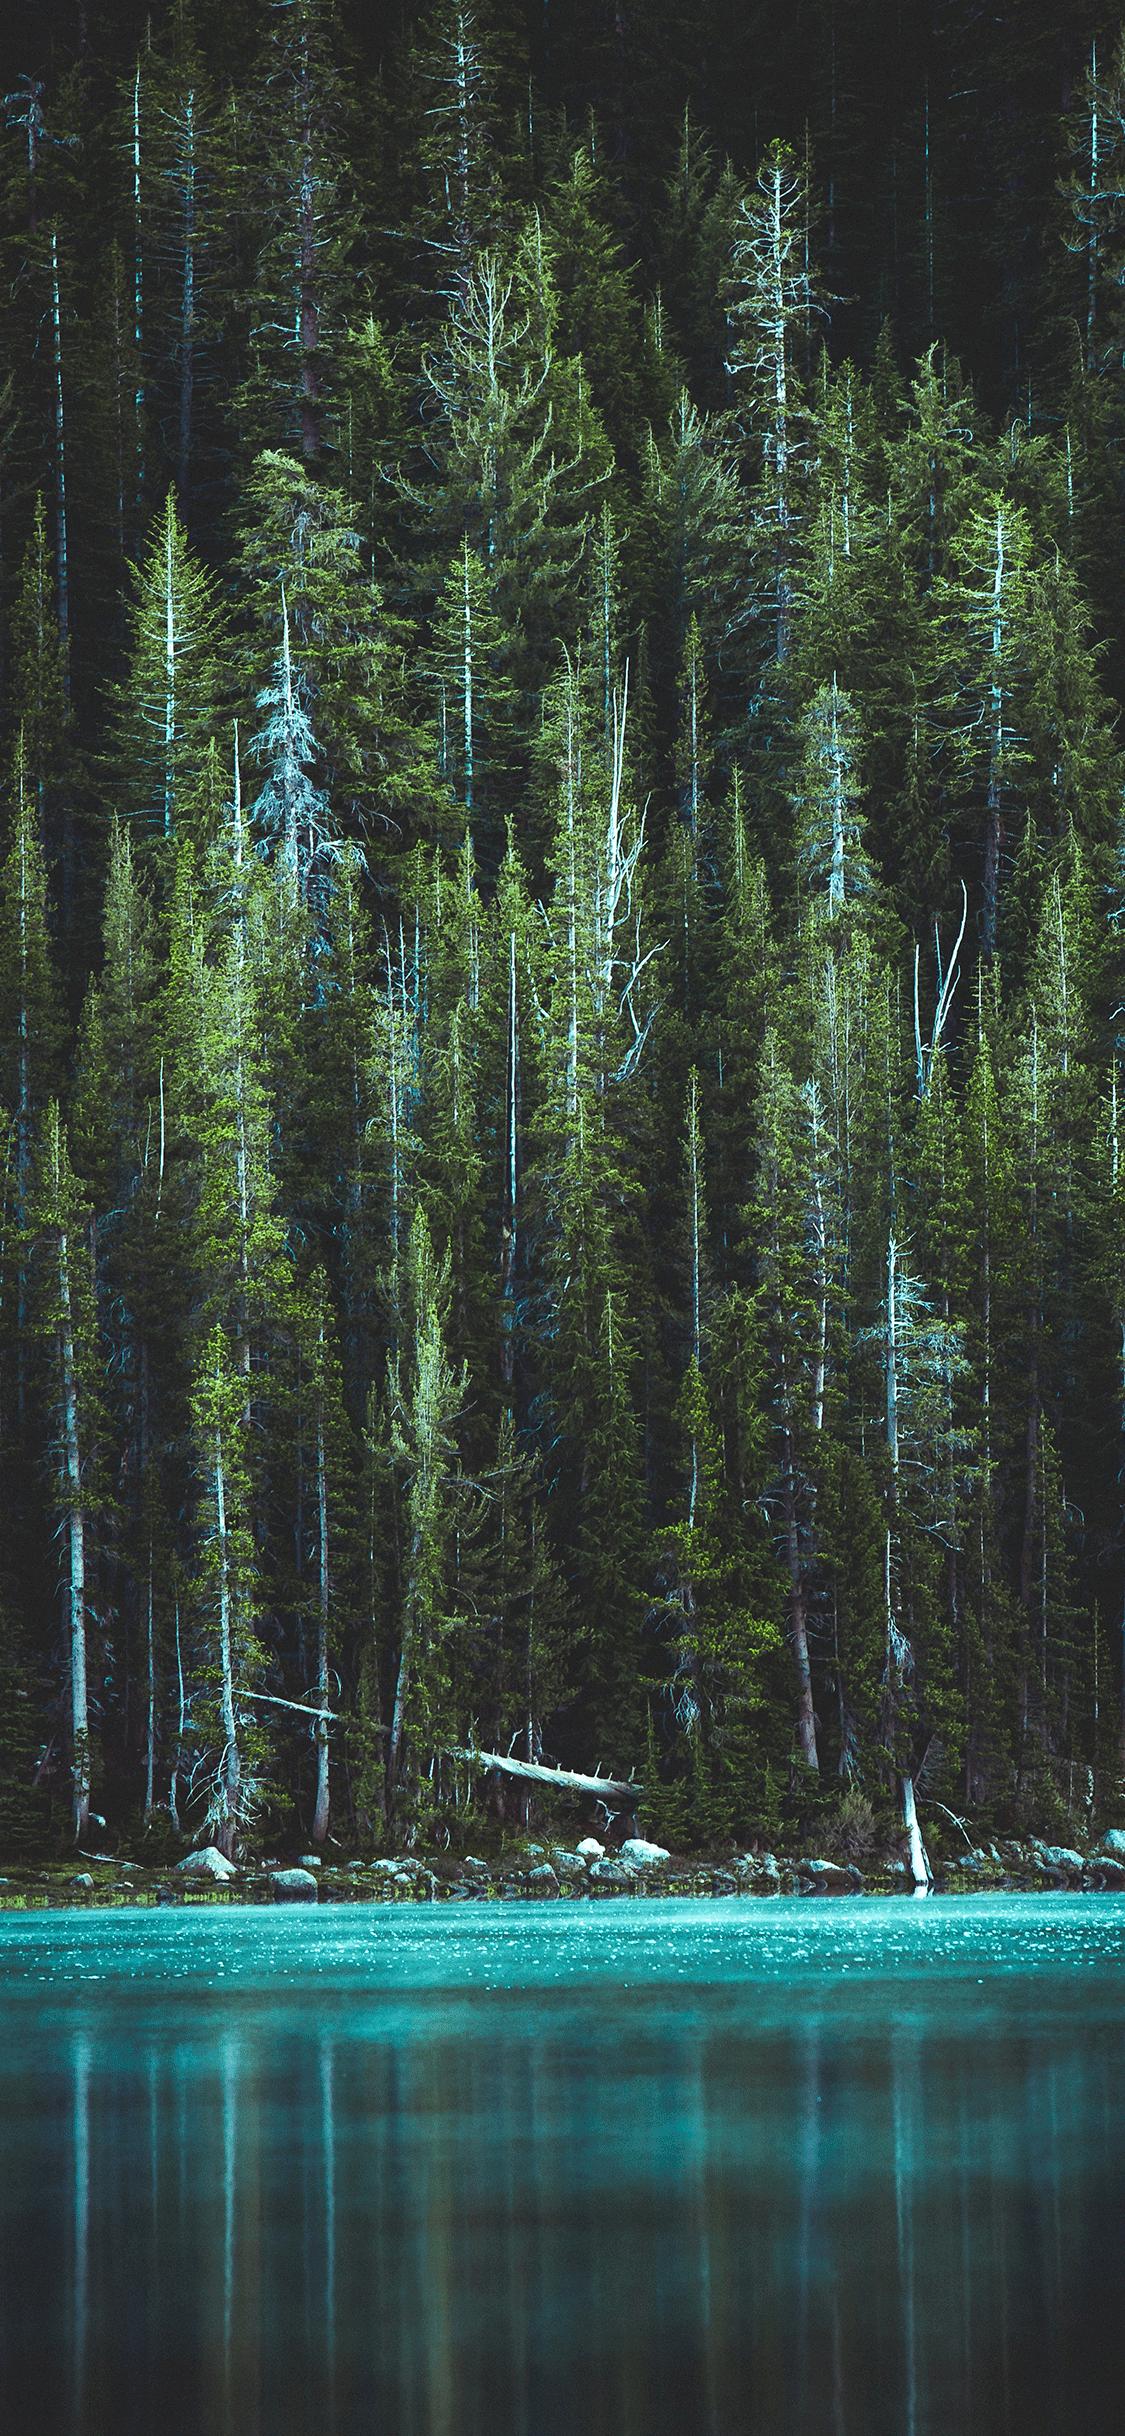 iPhone wallpaper forest river Fonds d'écran iPhone du 14/08/2018